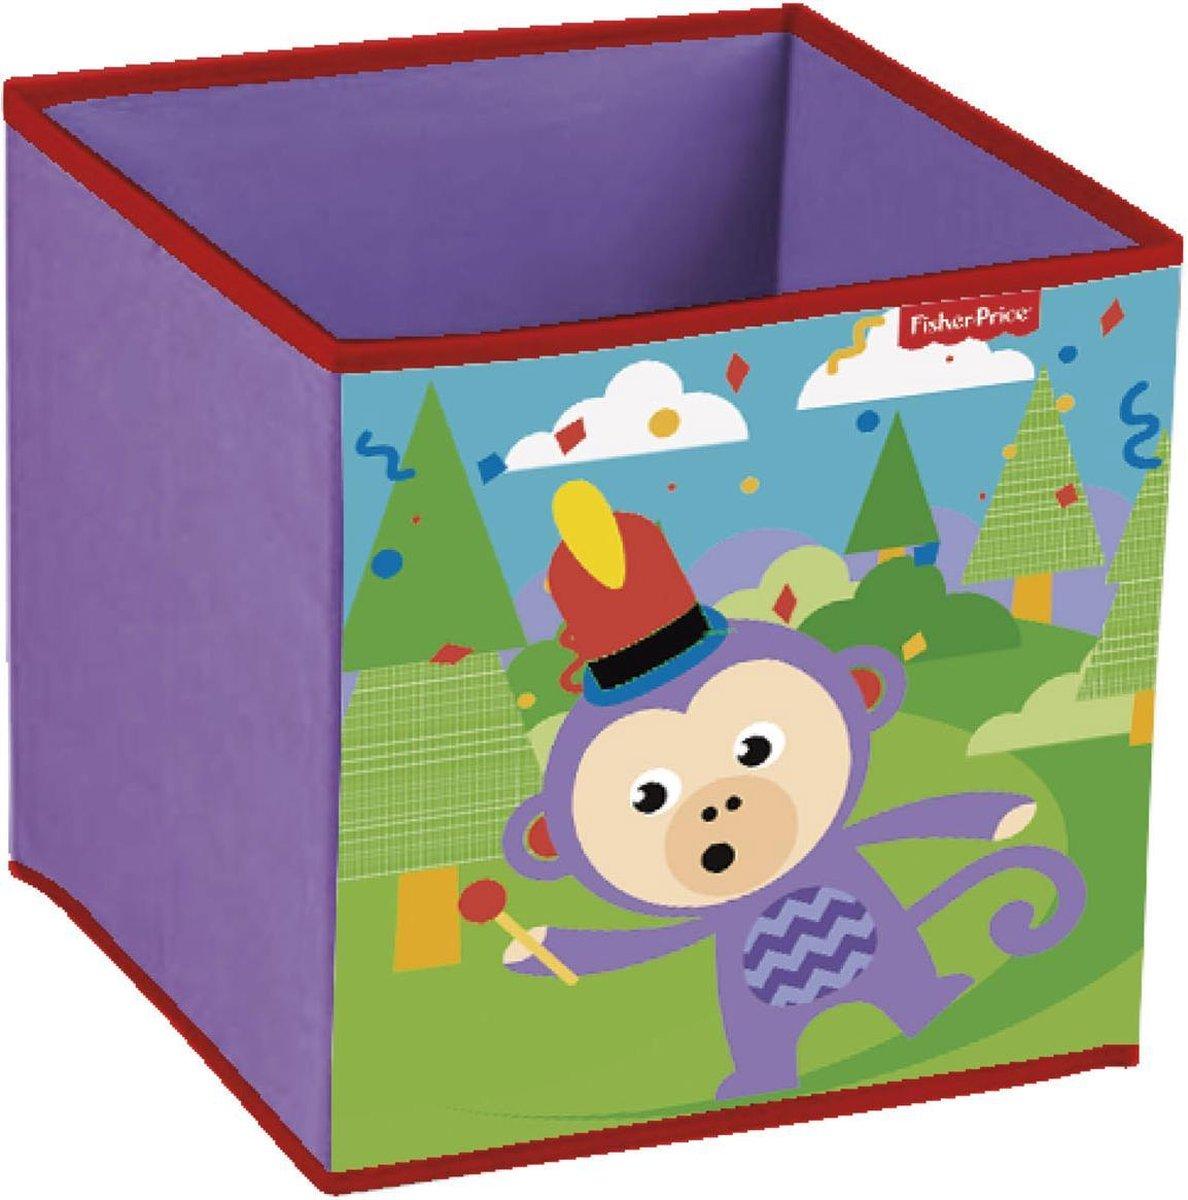 Fisher Price Opbergbox - Aapje Afmeting artikel: 31 x 31 x 31 cm